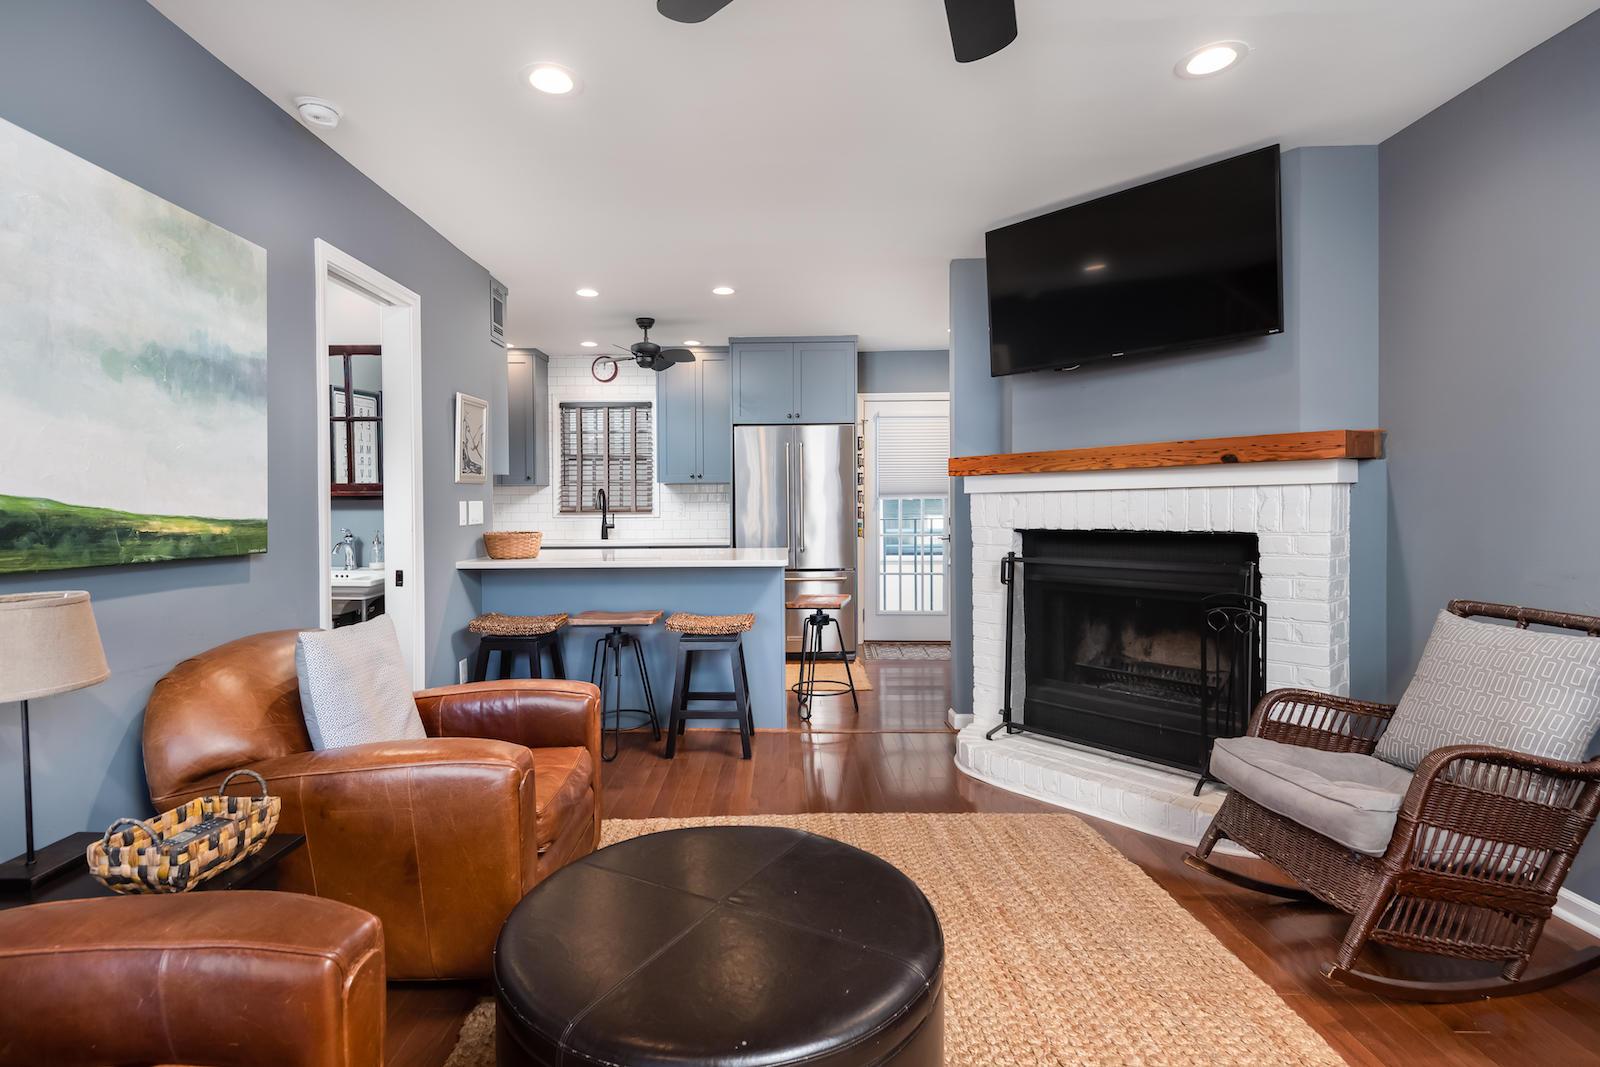 Harleston Village Homes For Sale - 15 Horlbeck, Charleston, SC - 4